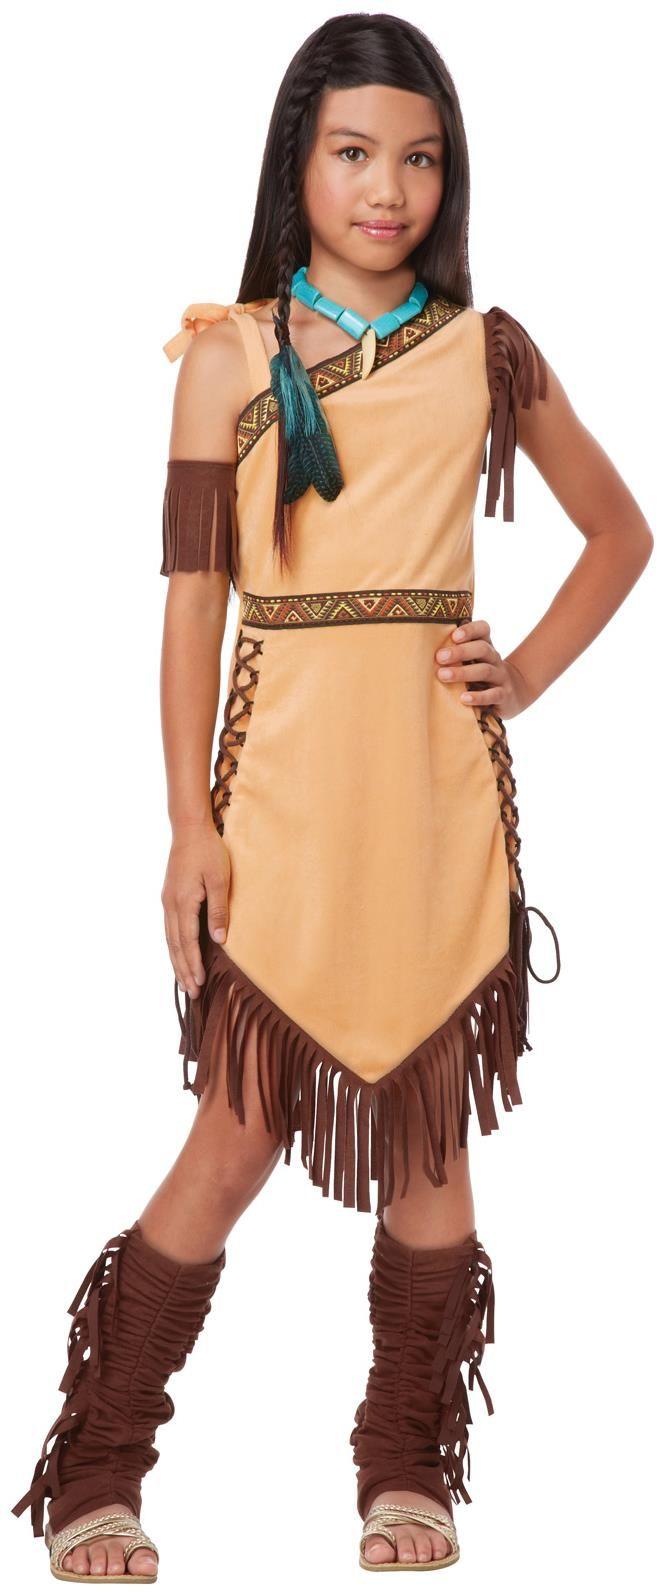 The dress halloween costume - Girls Native American Princess Child Costume For Halloween